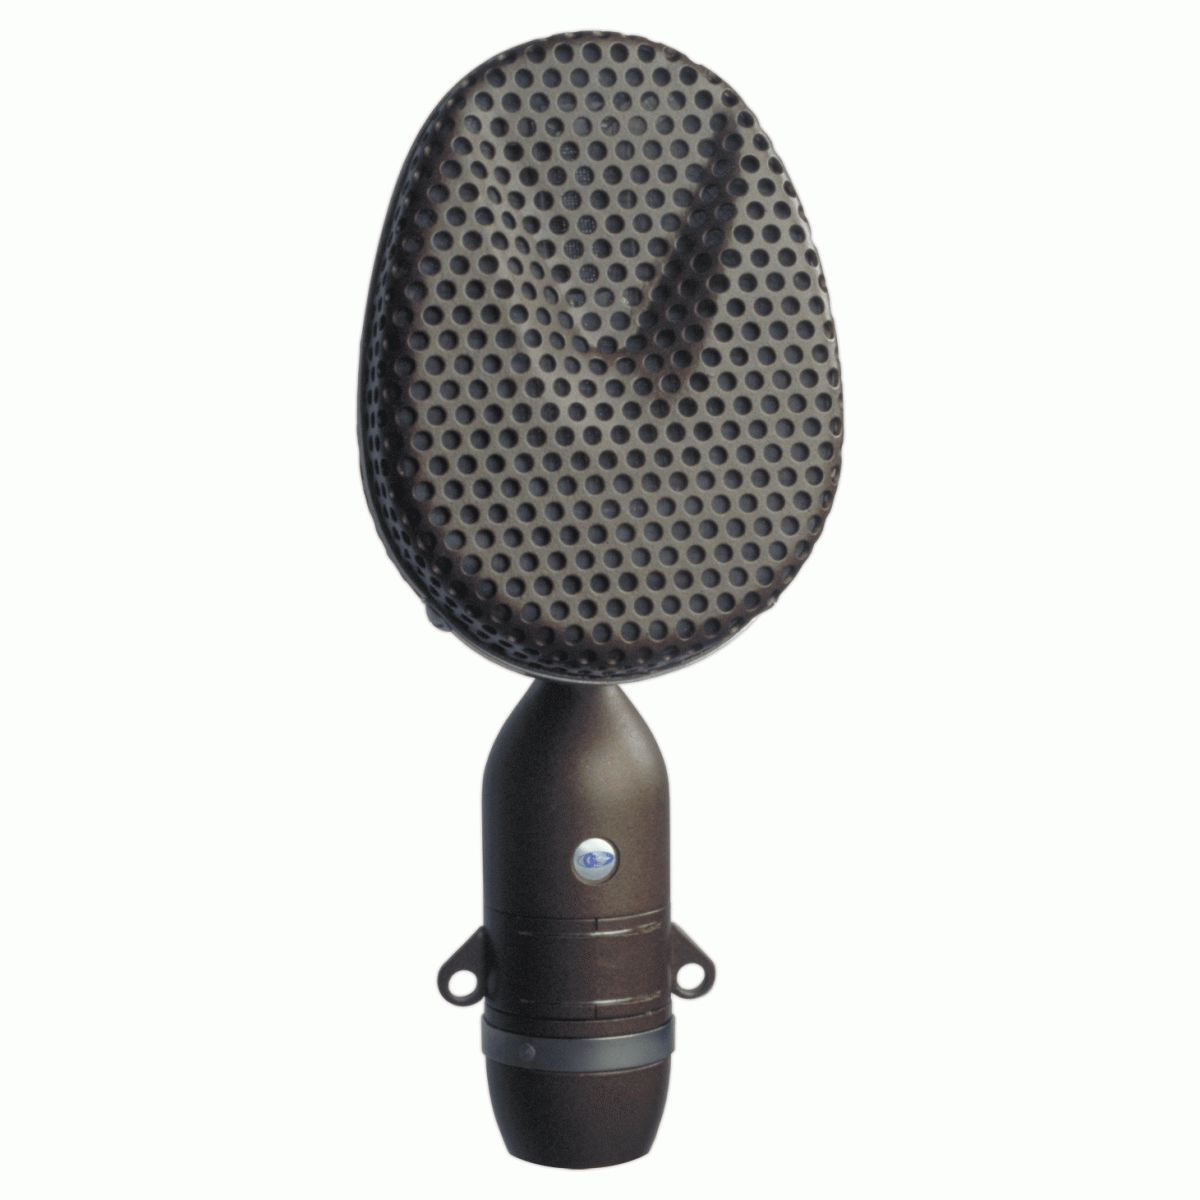 Coles 4038 | new studio microphones | Studio, Music, News studio